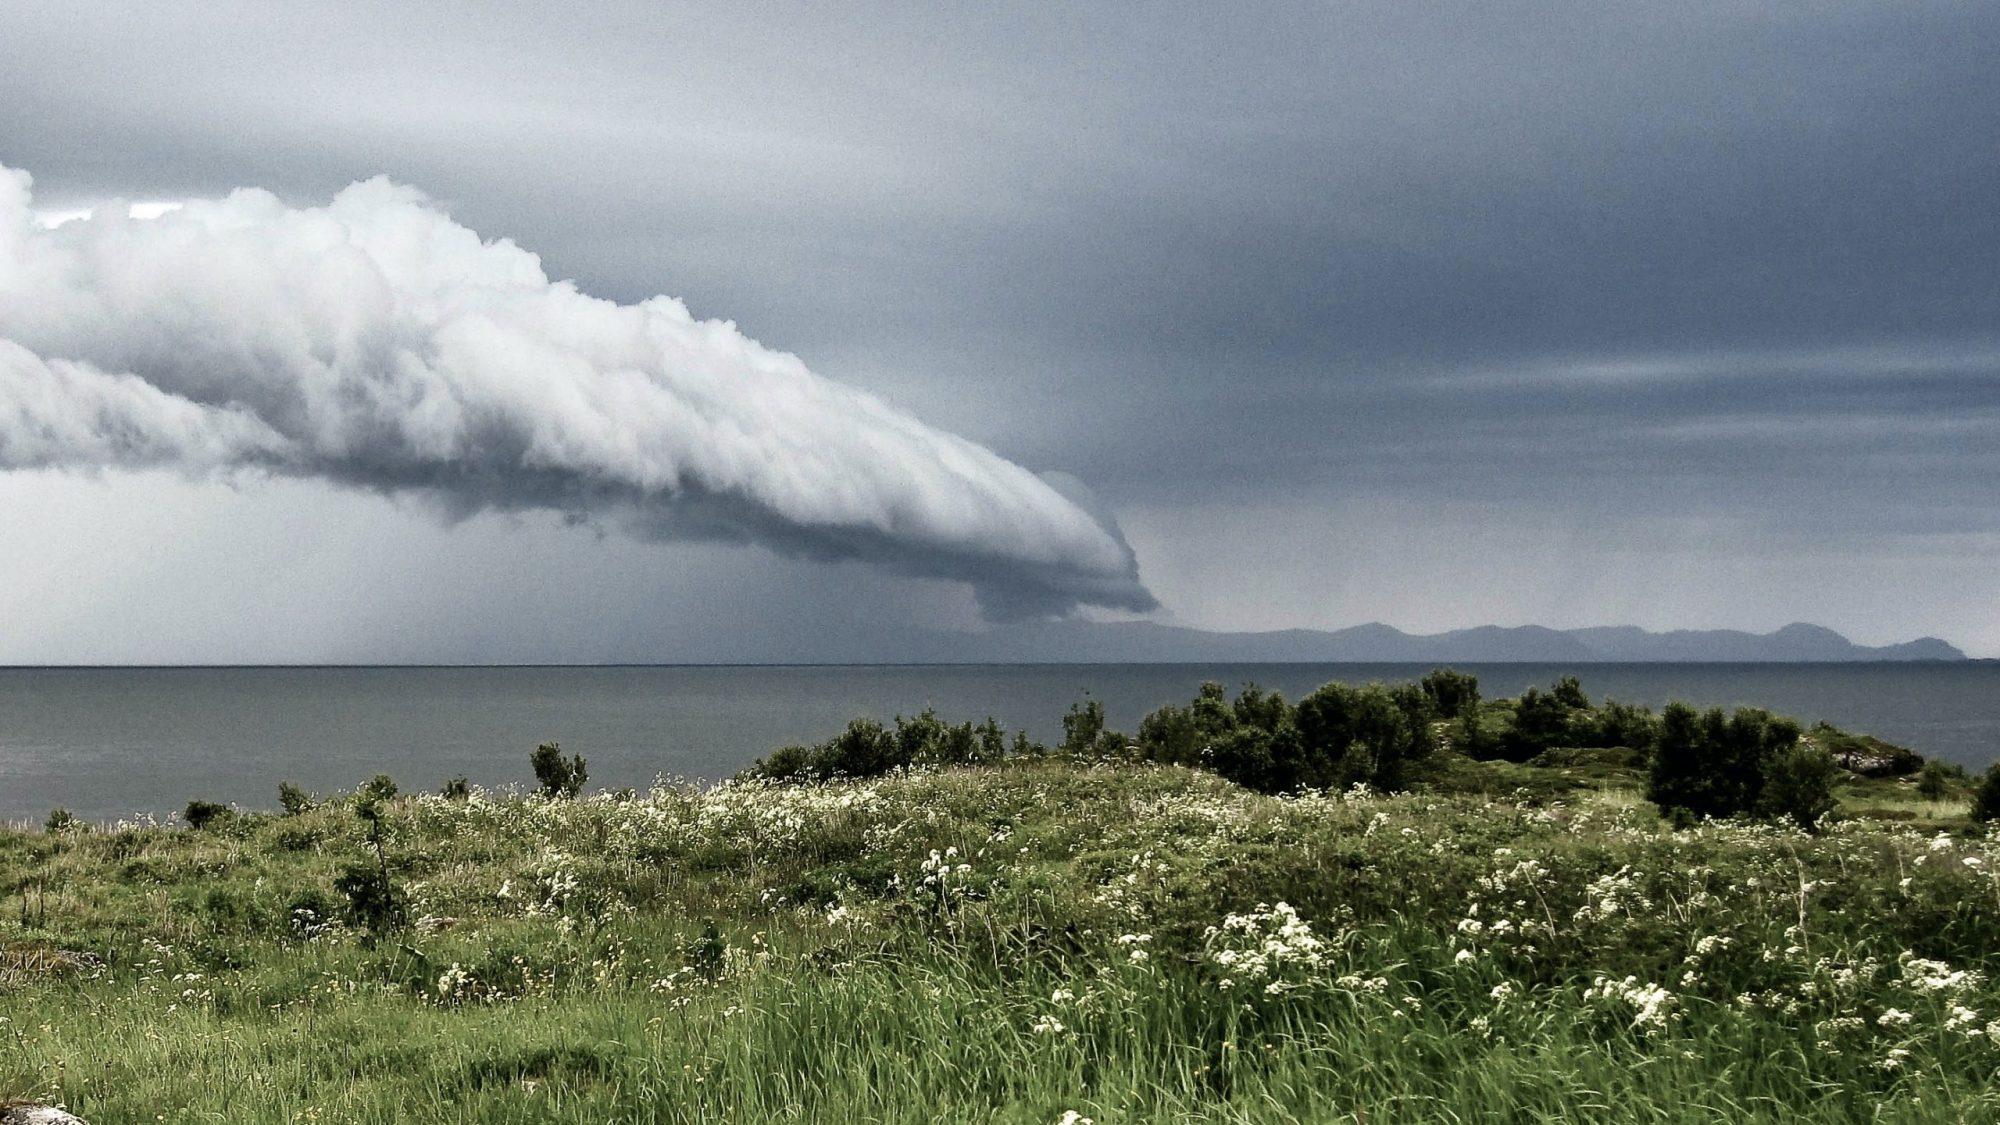 Rapport Fra Stormens øye